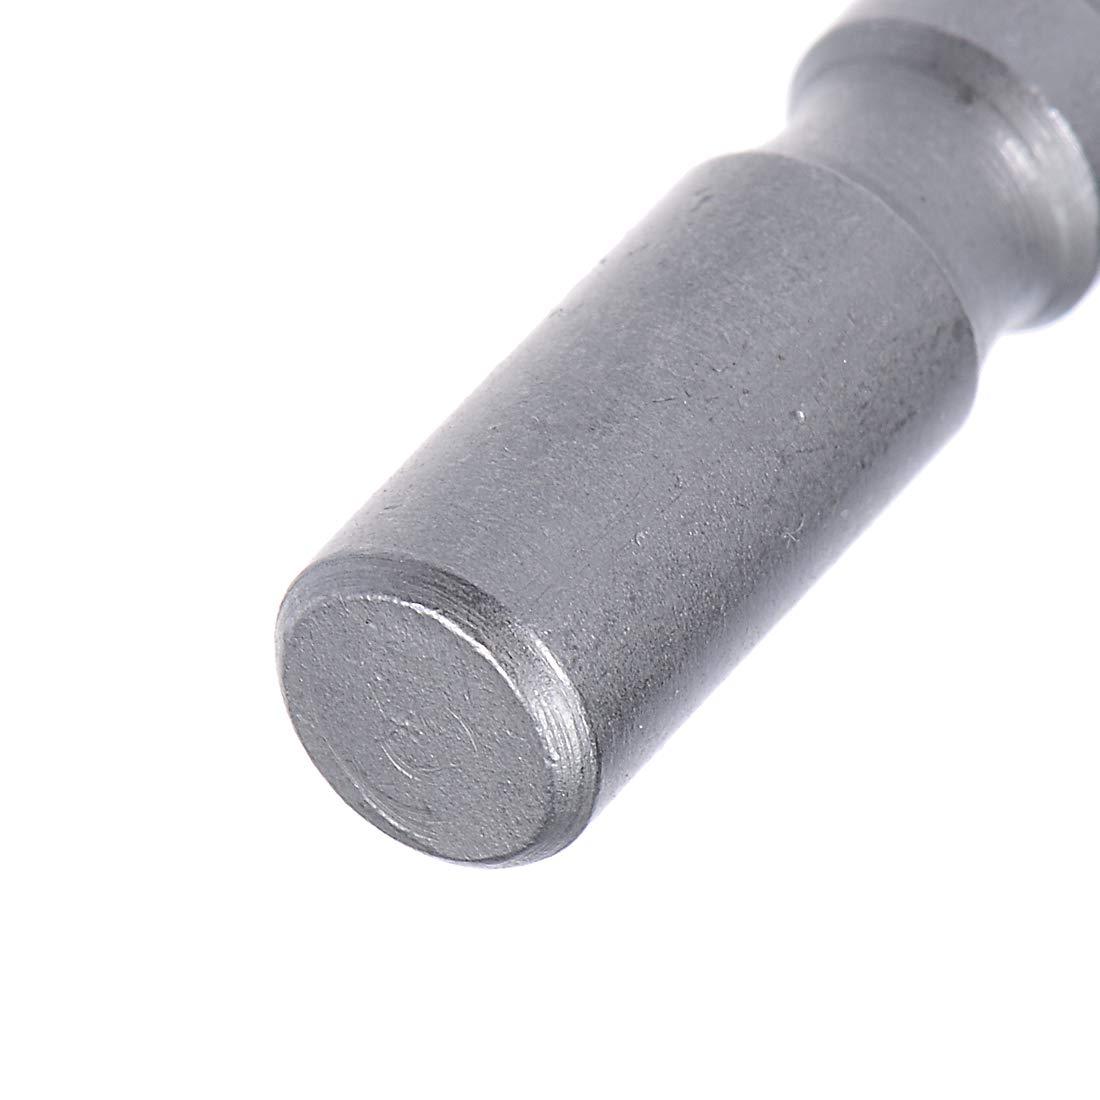 uxcell Hardware Part Magnetic 4x50mm T25 Type Torx Screwdriver Bits 10 Pcs a13071100ux0114